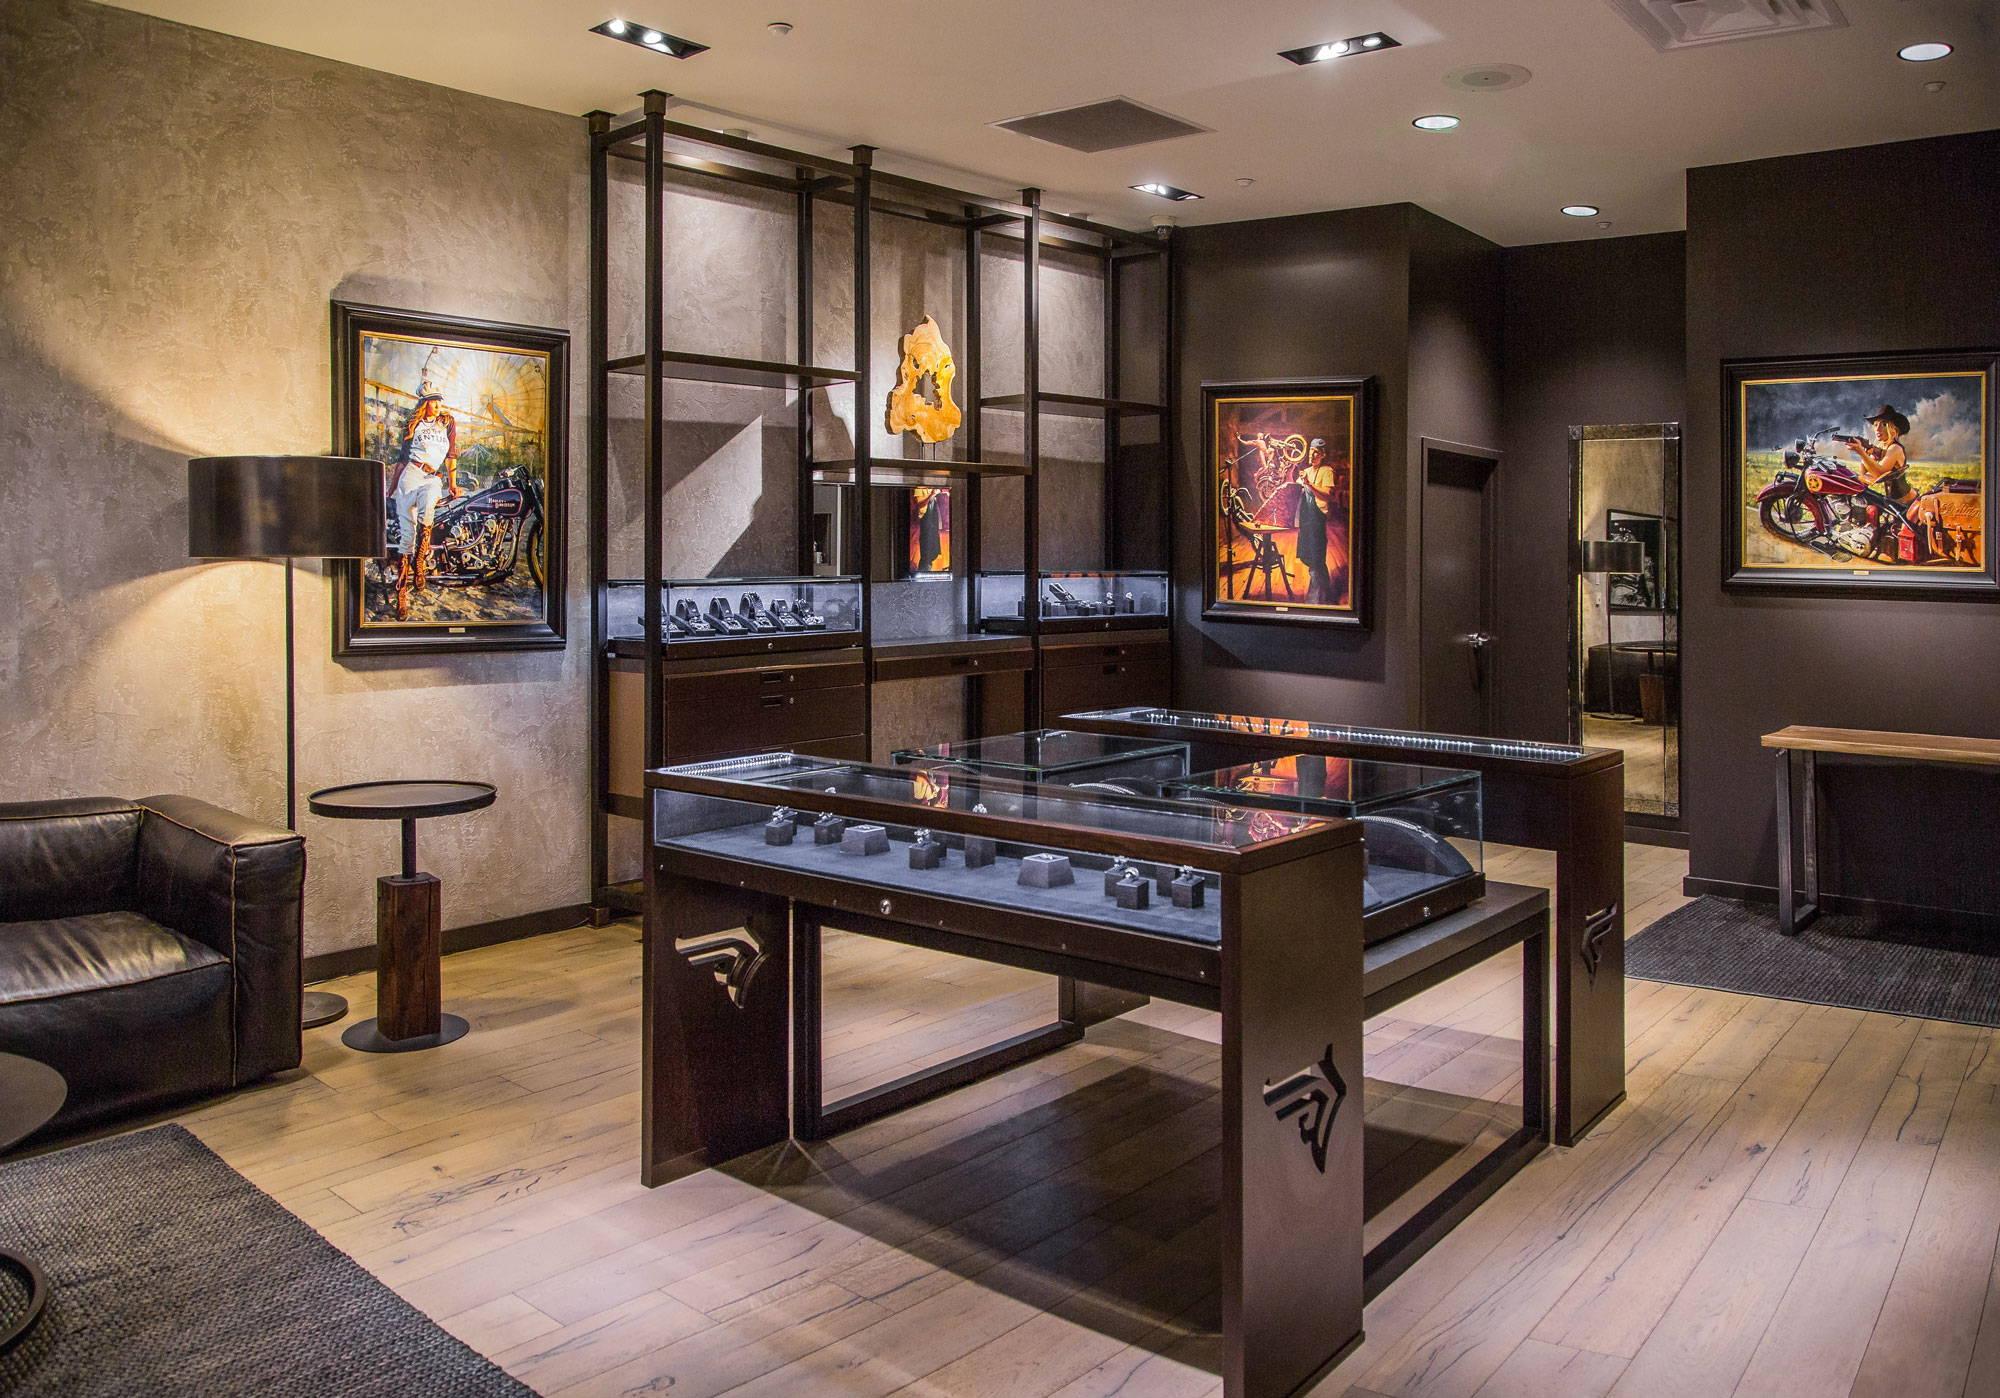 NightRider Jewelry Cherry Creek Shopping Center, Denver, Colorado - Interior